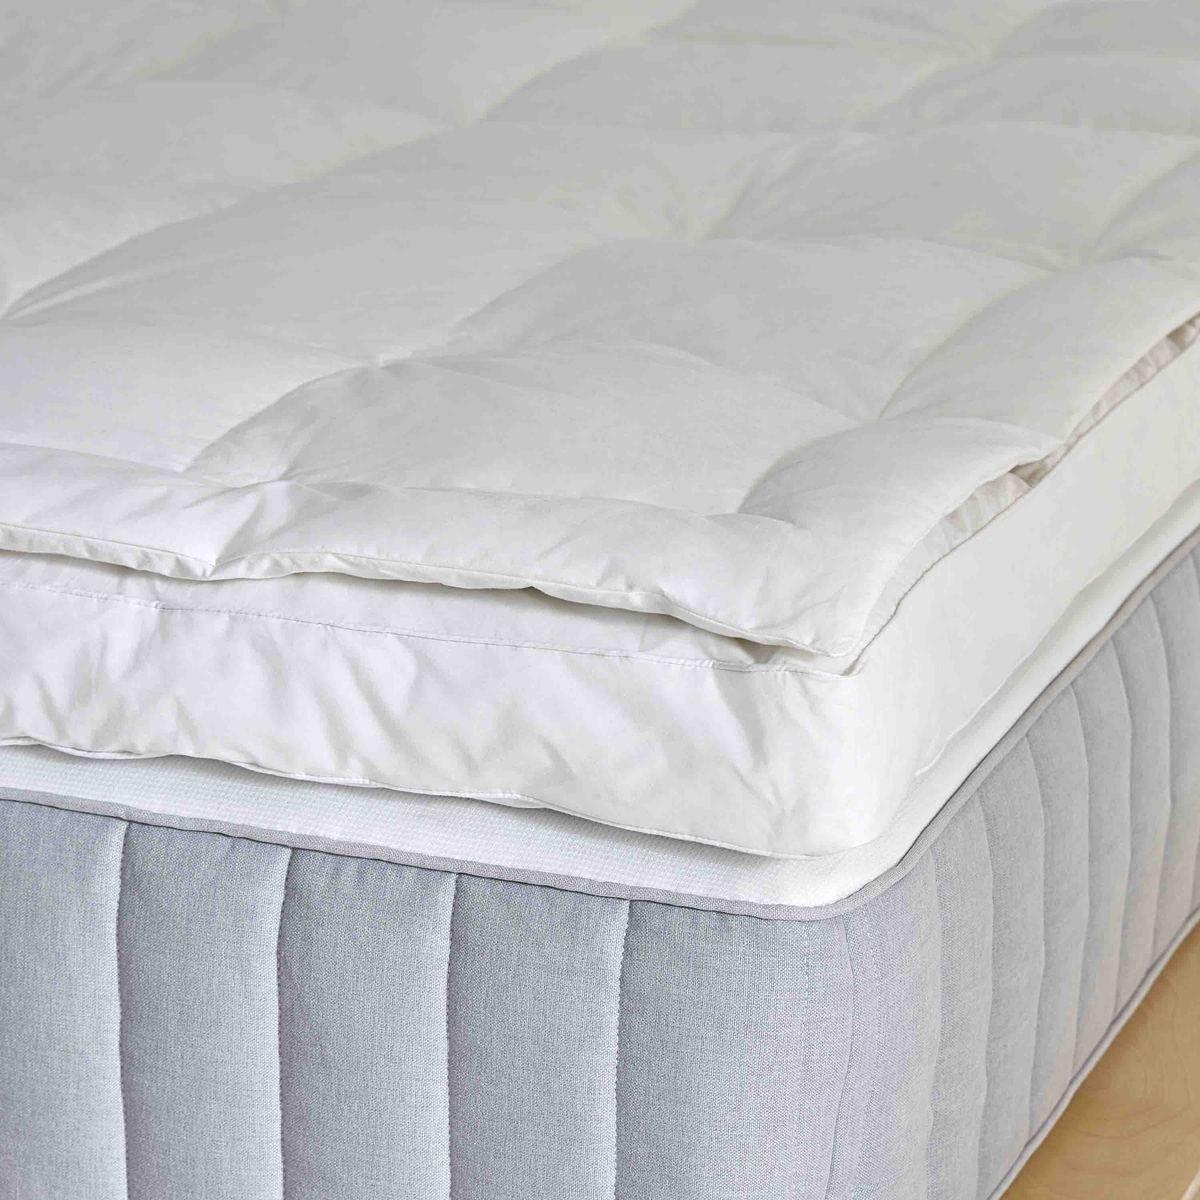 Down Mattress Topper Mattress Mattress Topper Plush Pillows